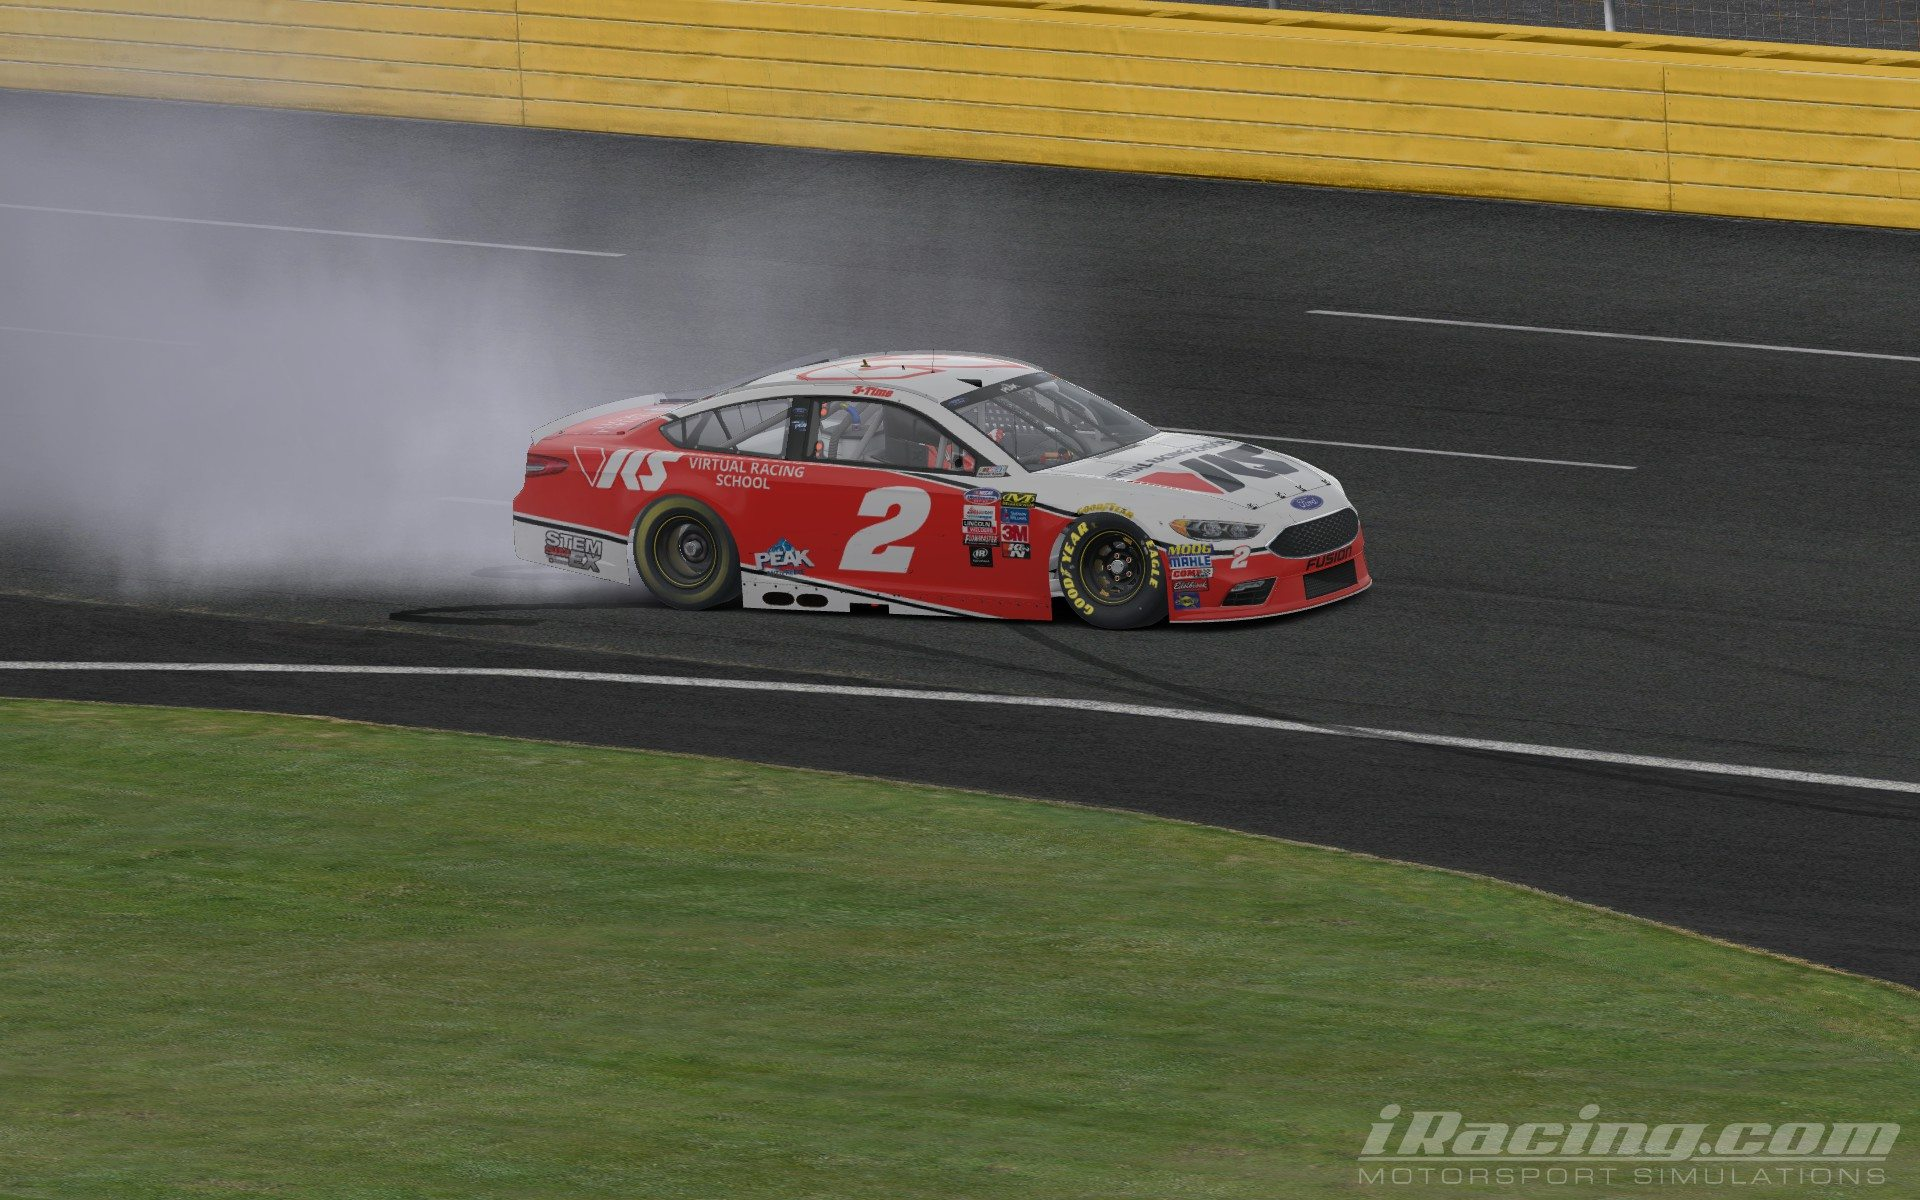 Ray Alfalla wins NASCAR PEAK Antifreeze Series race at Charlotte